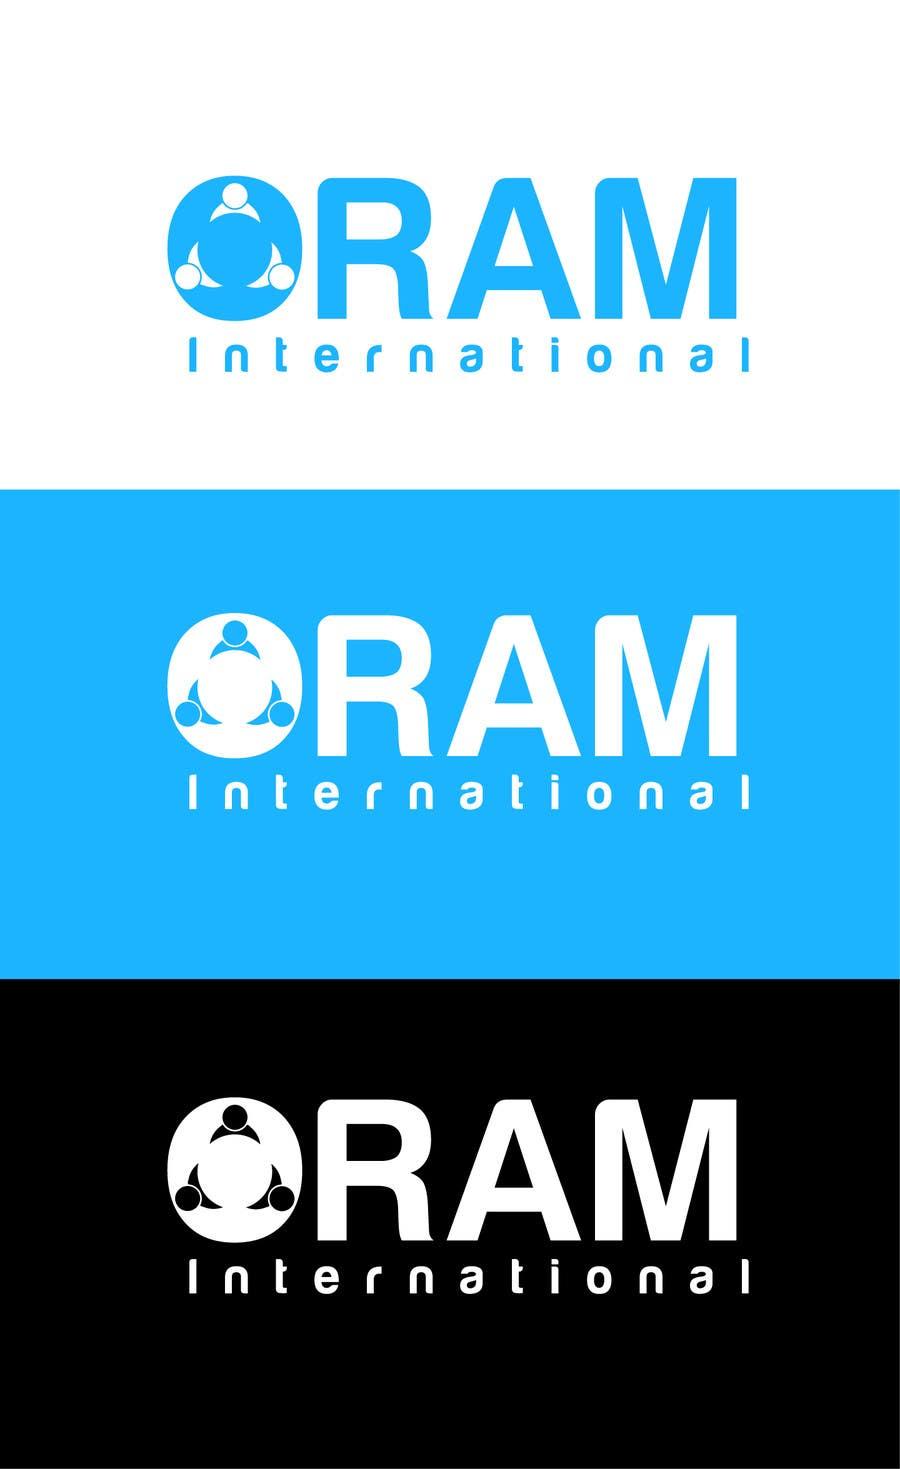 Proposition n°                                        21                                      du concours                                         Design a Logo for ORAM International